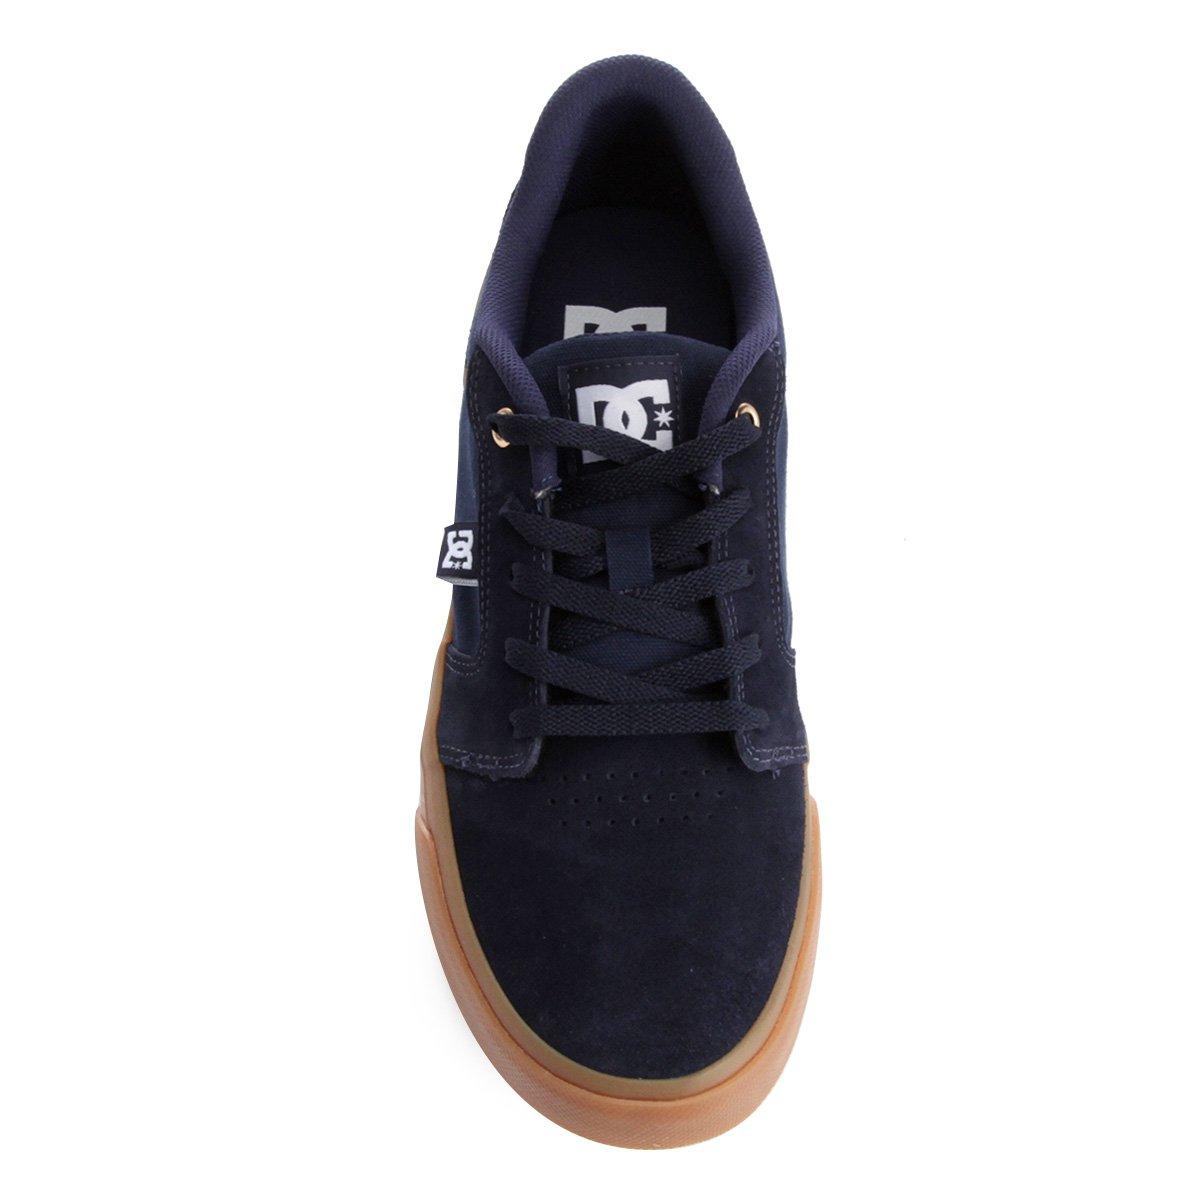 Tênis DC Shoes Anvil LA Masculino - Marinho - Compre Agora  fbb0a2ea5e949